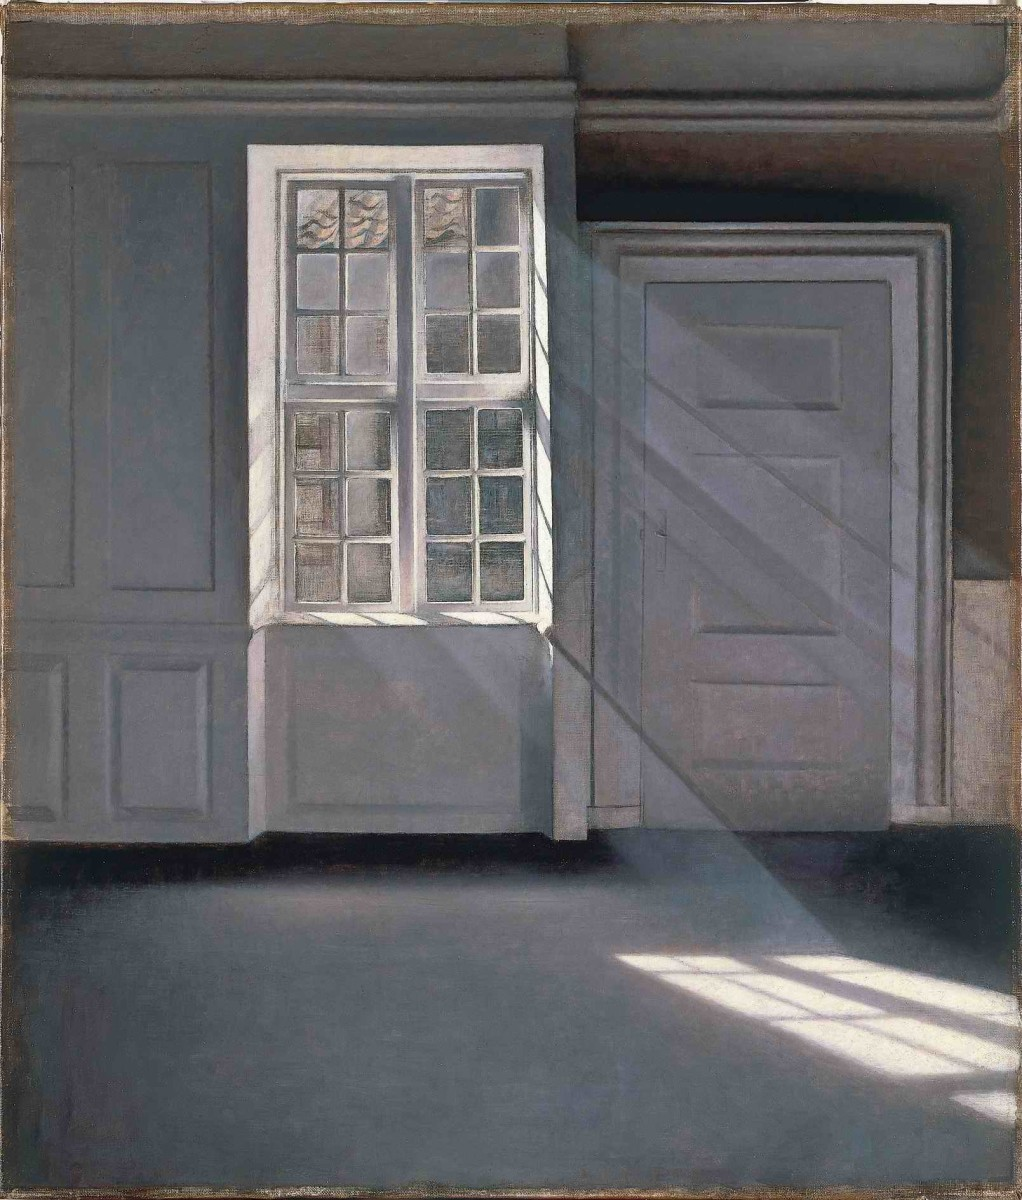 About Vilhelm Hammershoi - Danish Artist